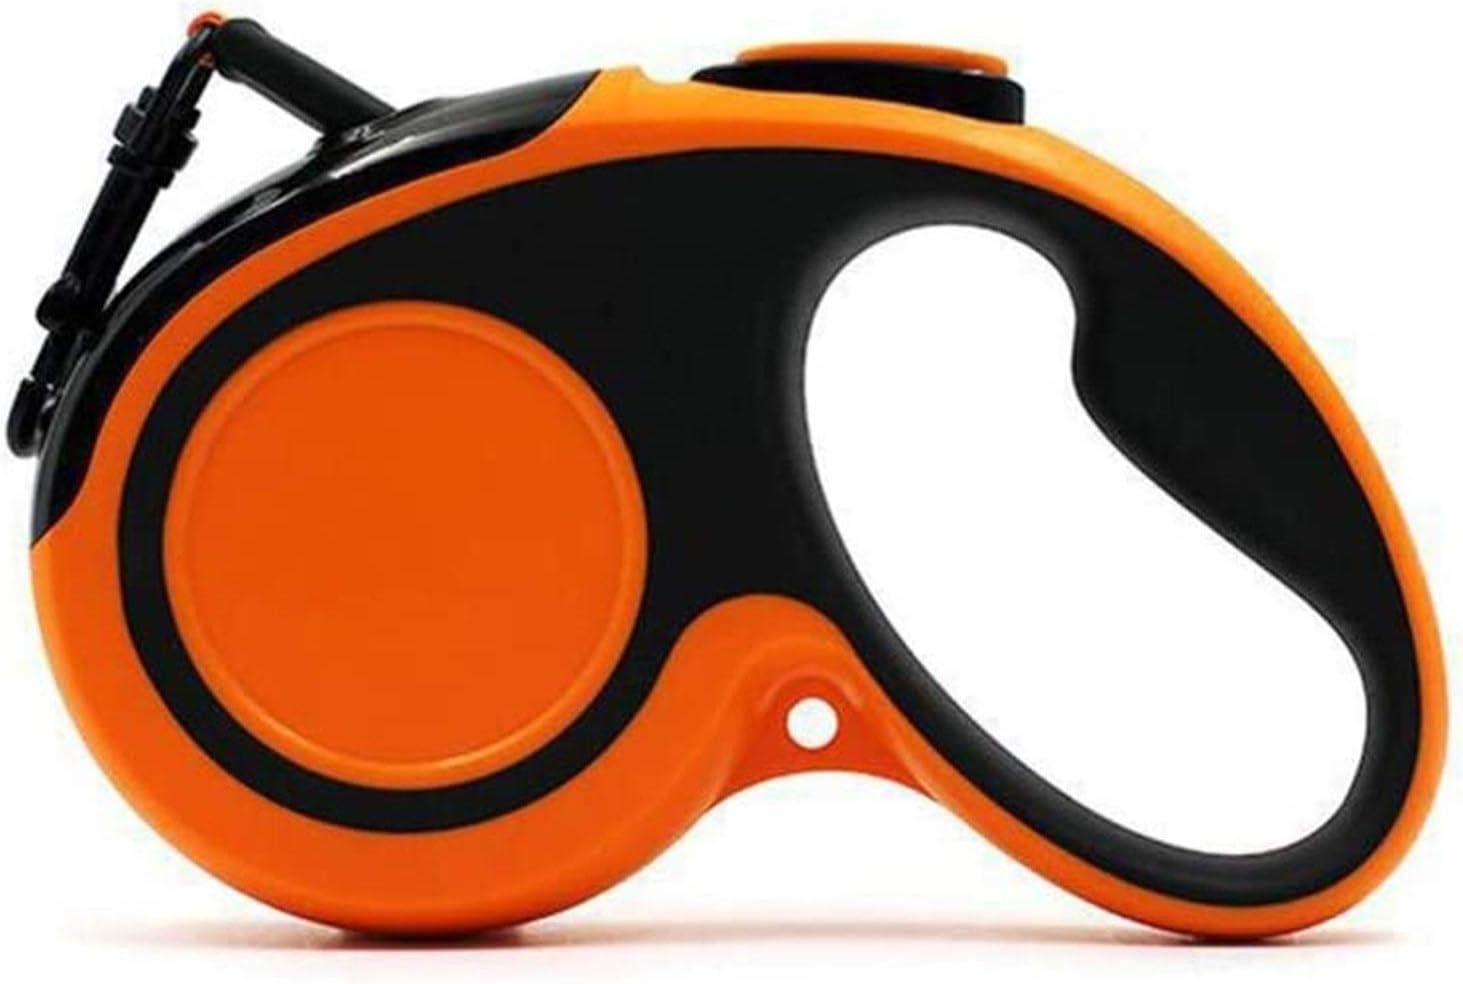 HSY SHOP Roll-Leash-Retractable Dog Leash Max 64% OFF Retractable Nylon 5m H Max 65% OFF